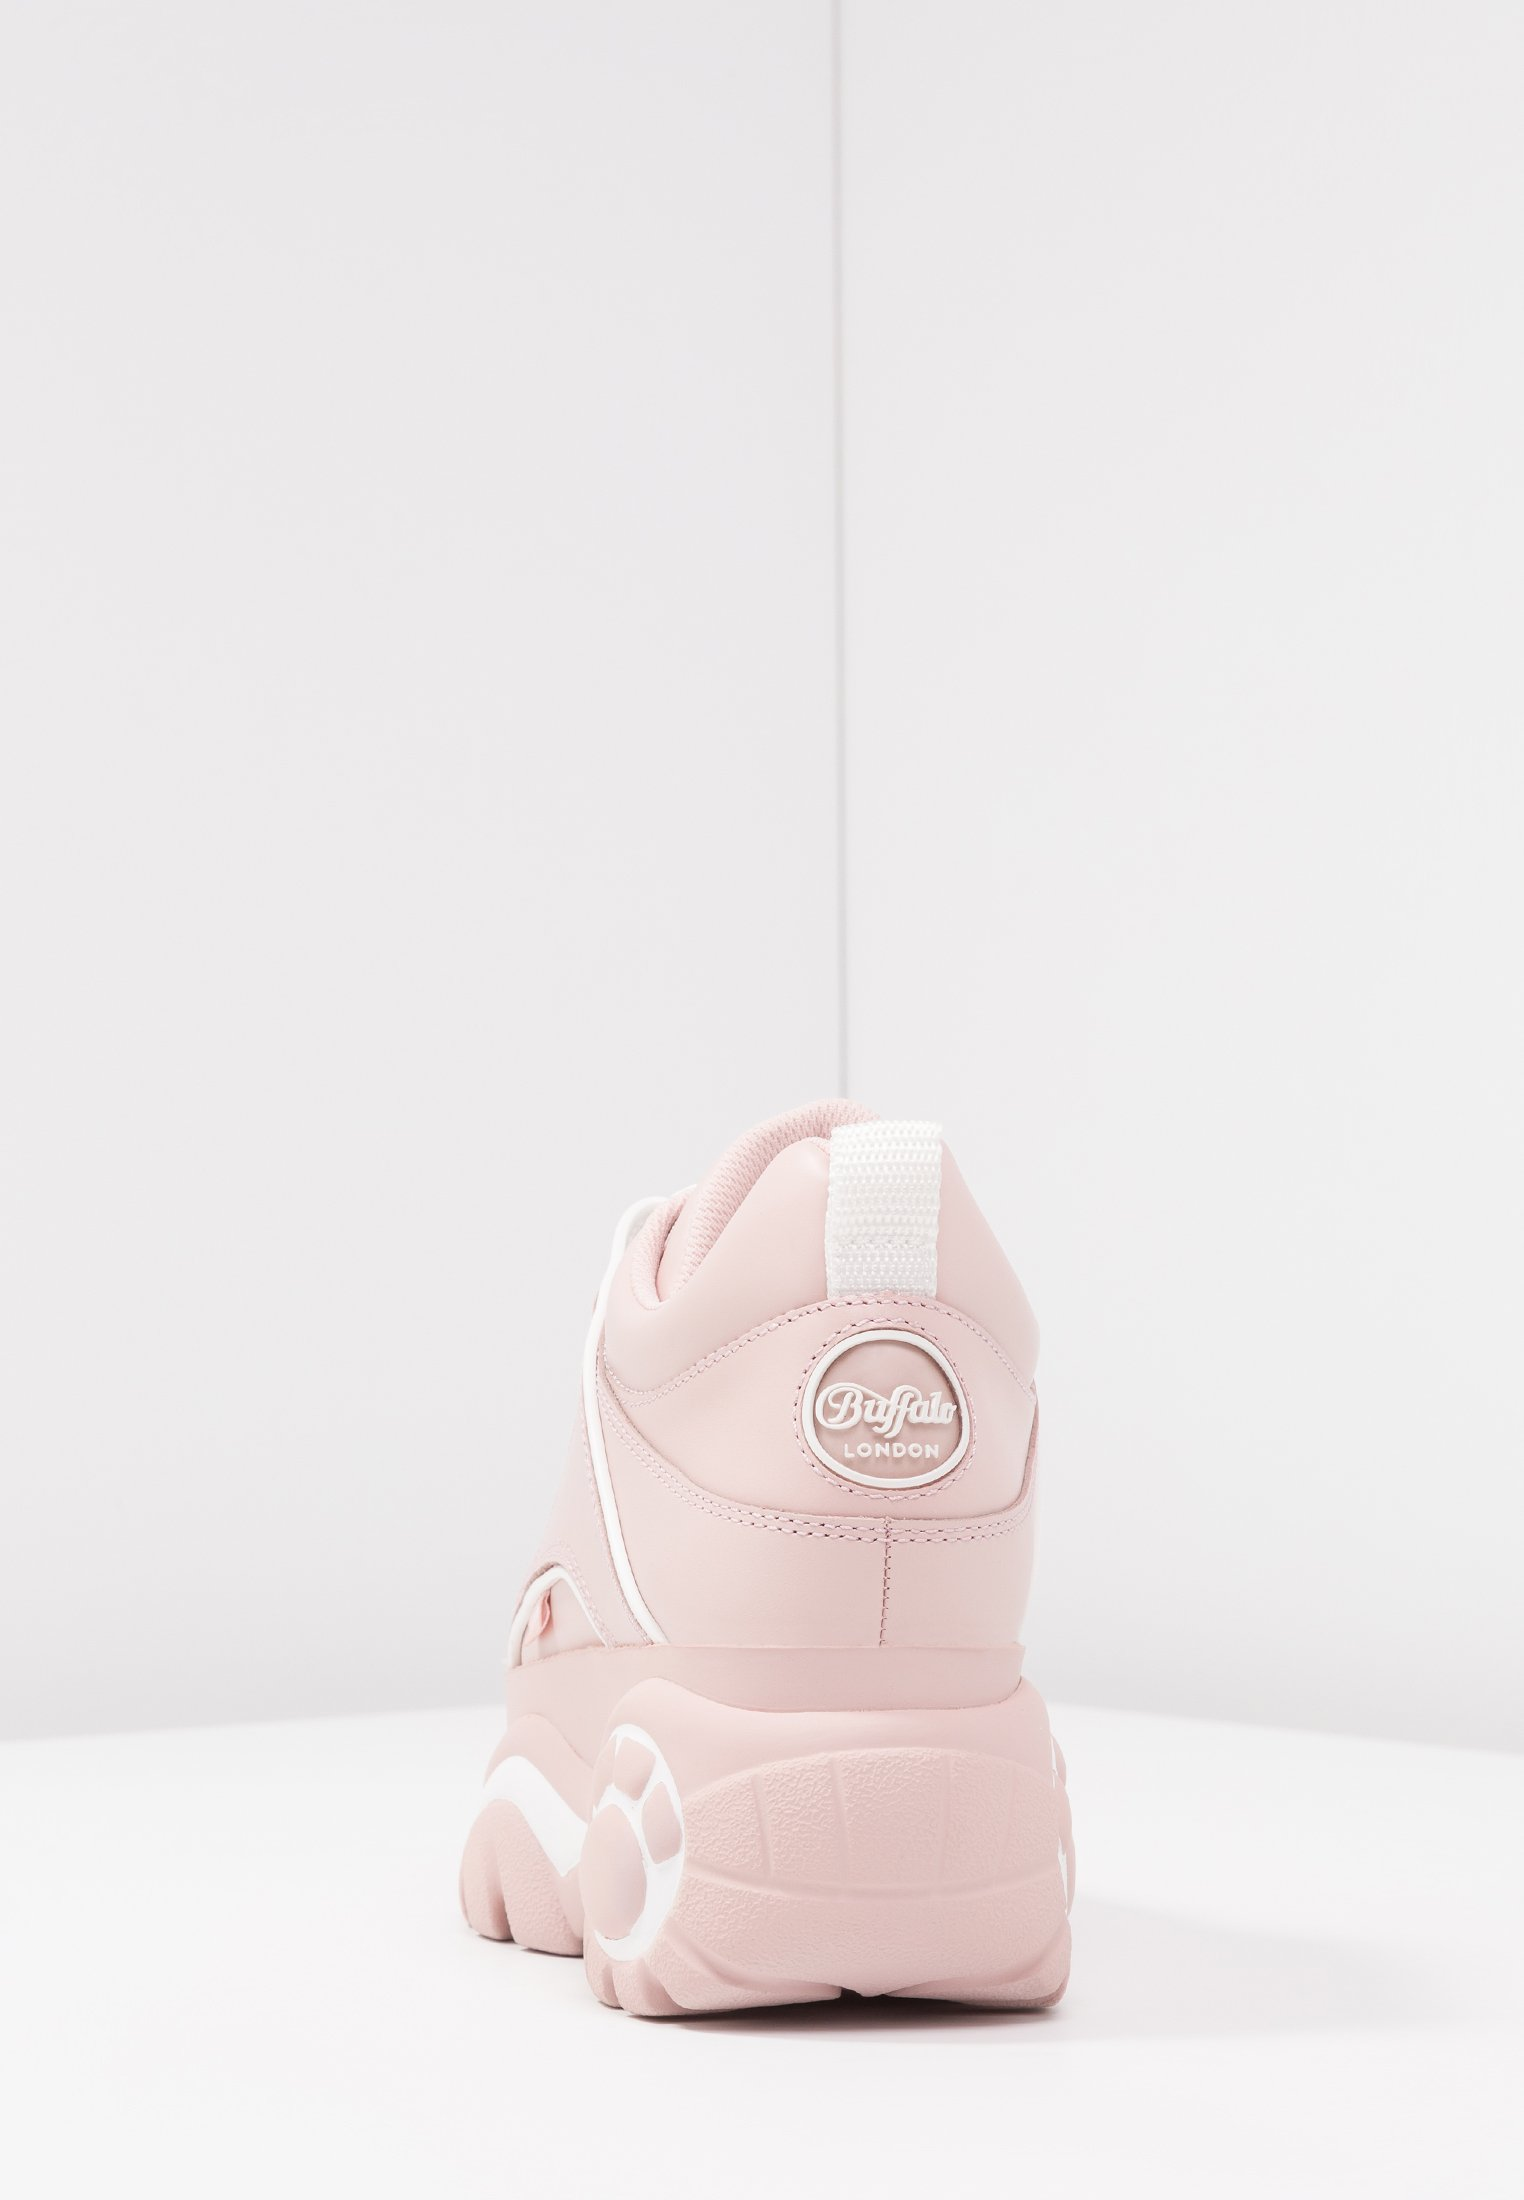 Buffalo London Sneakers - Baby Pink